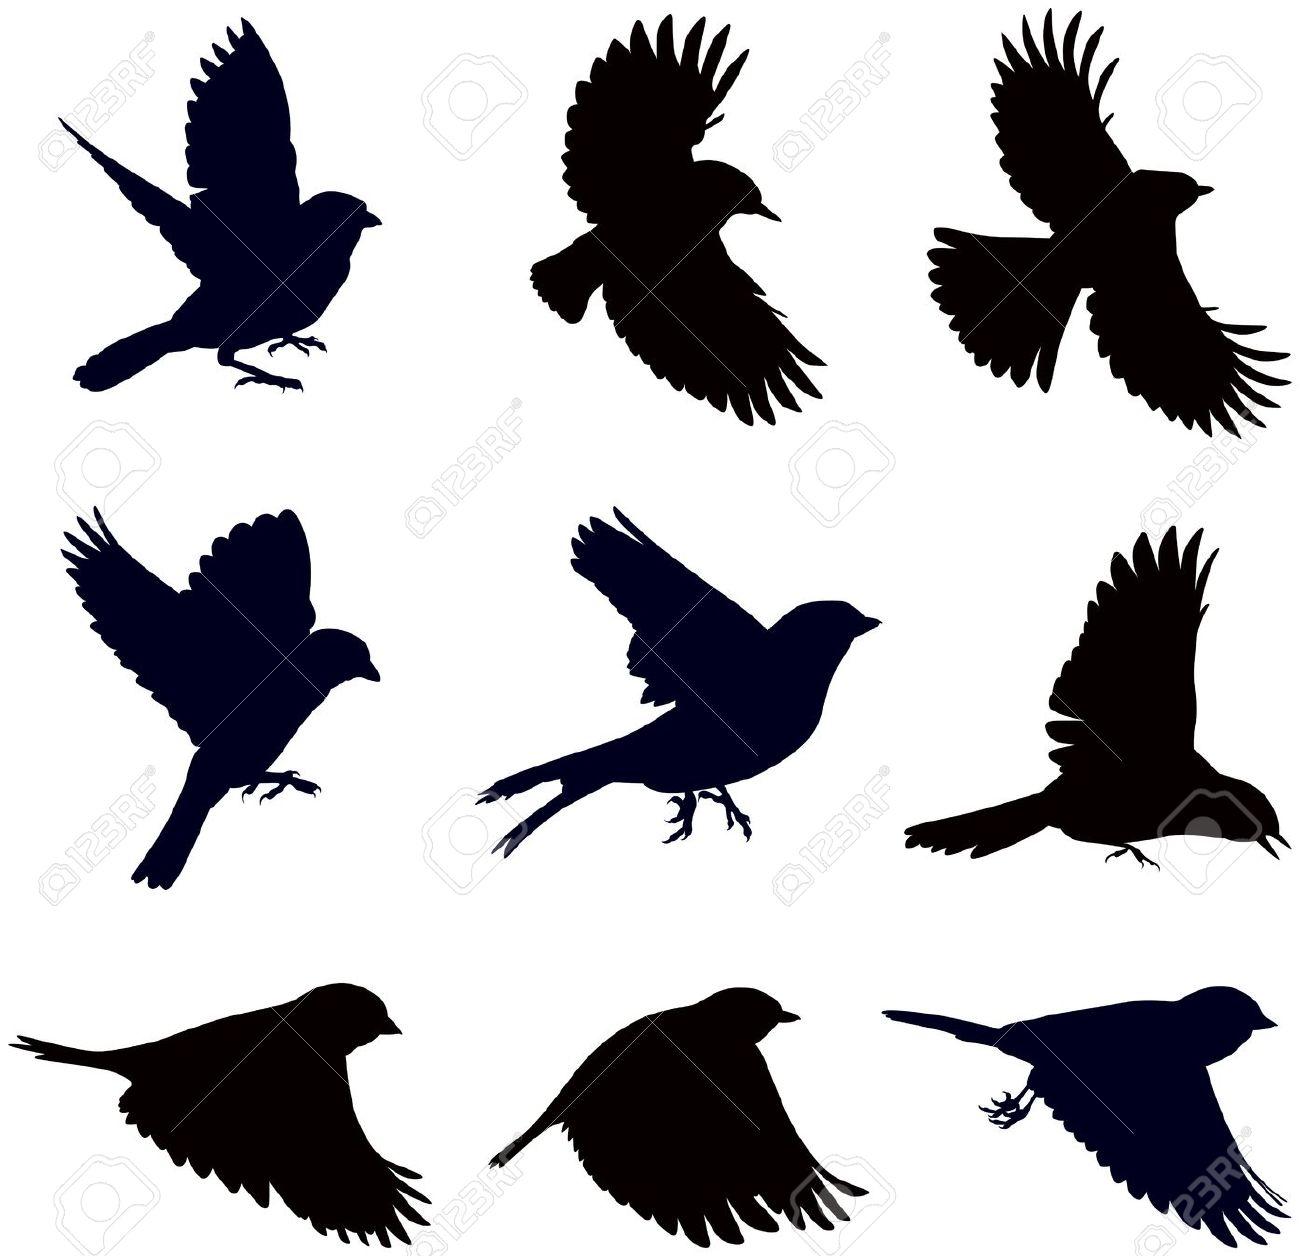 Sagome Di Uccelli, Passeri In Diverse Pose Clipart Royalty.